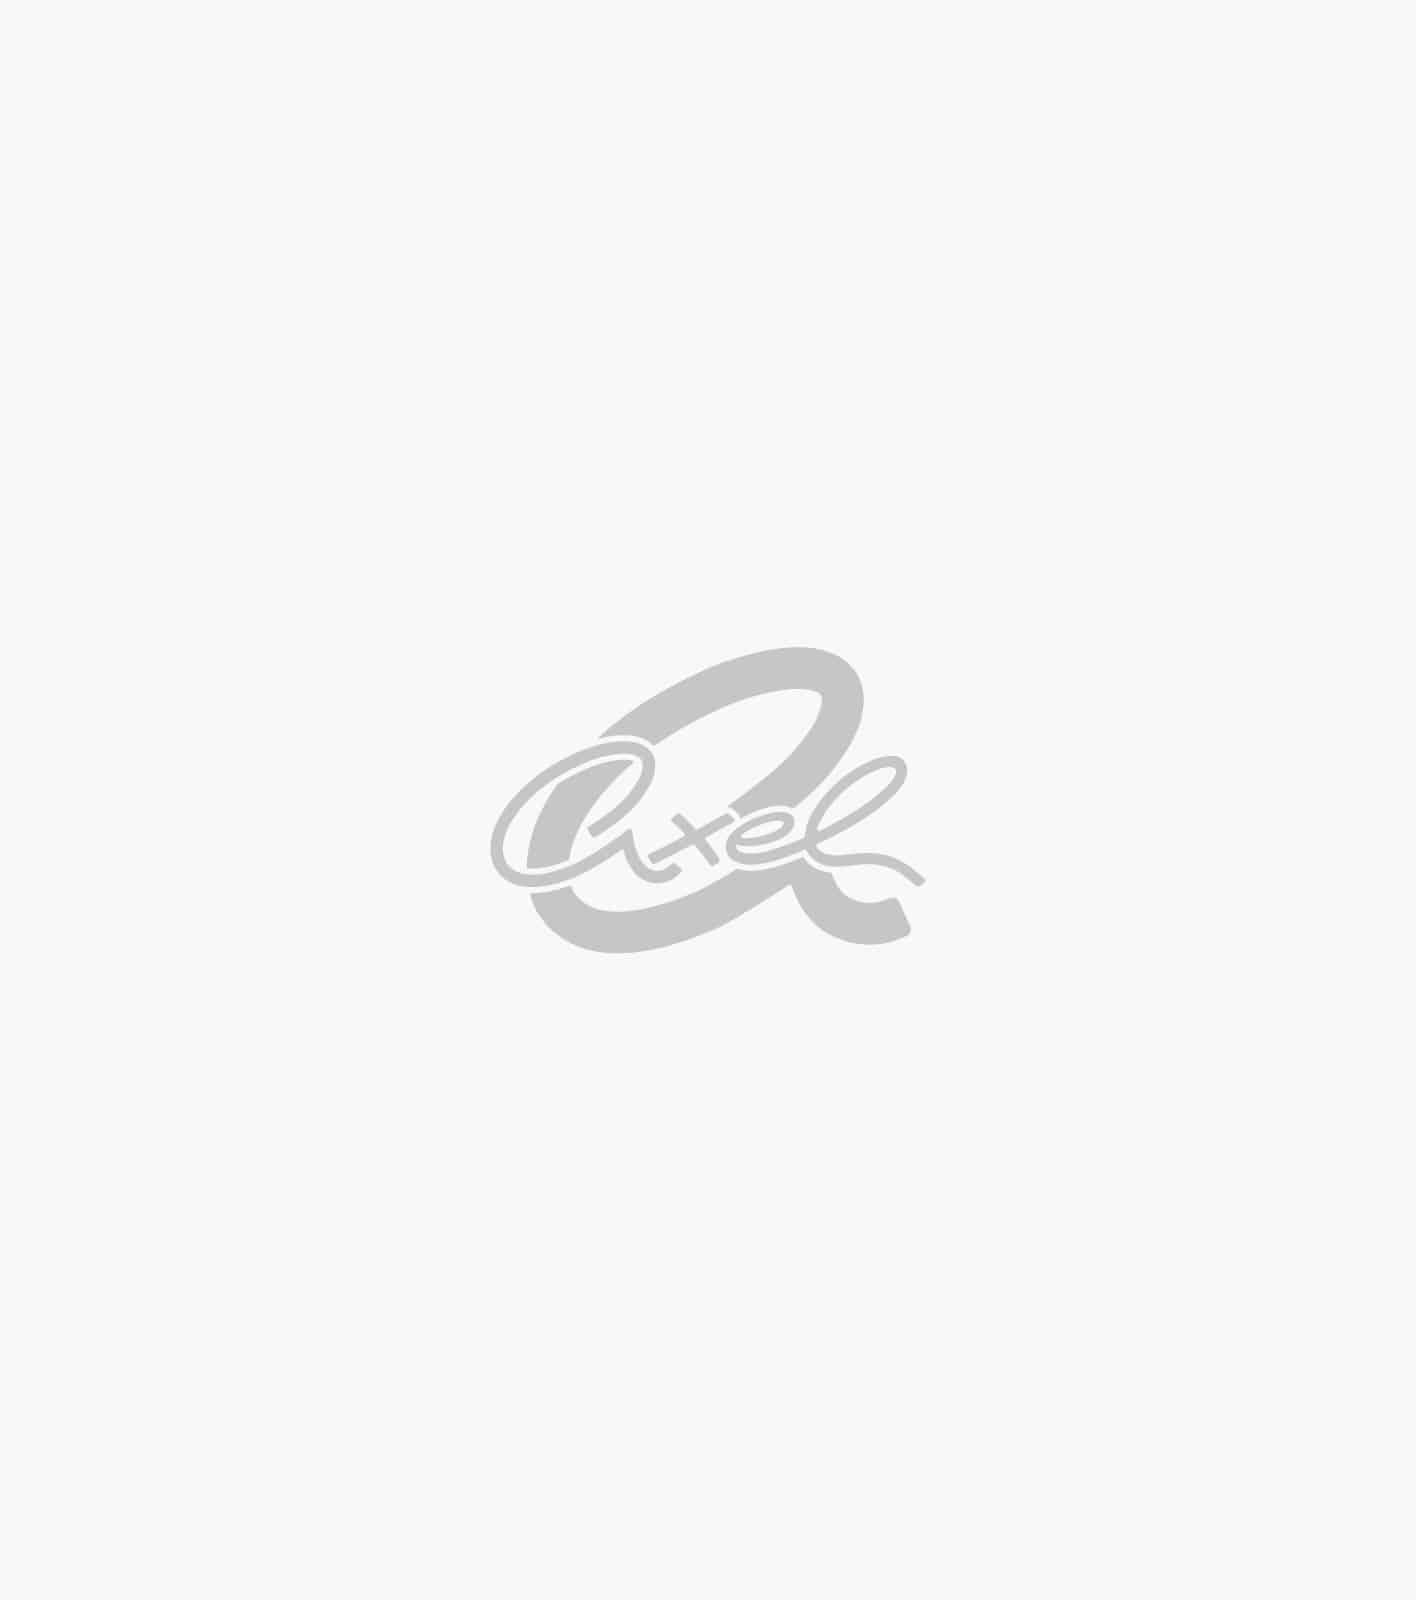 0d03cbb02797 Φορεματα καλοκαιρινα Axel online